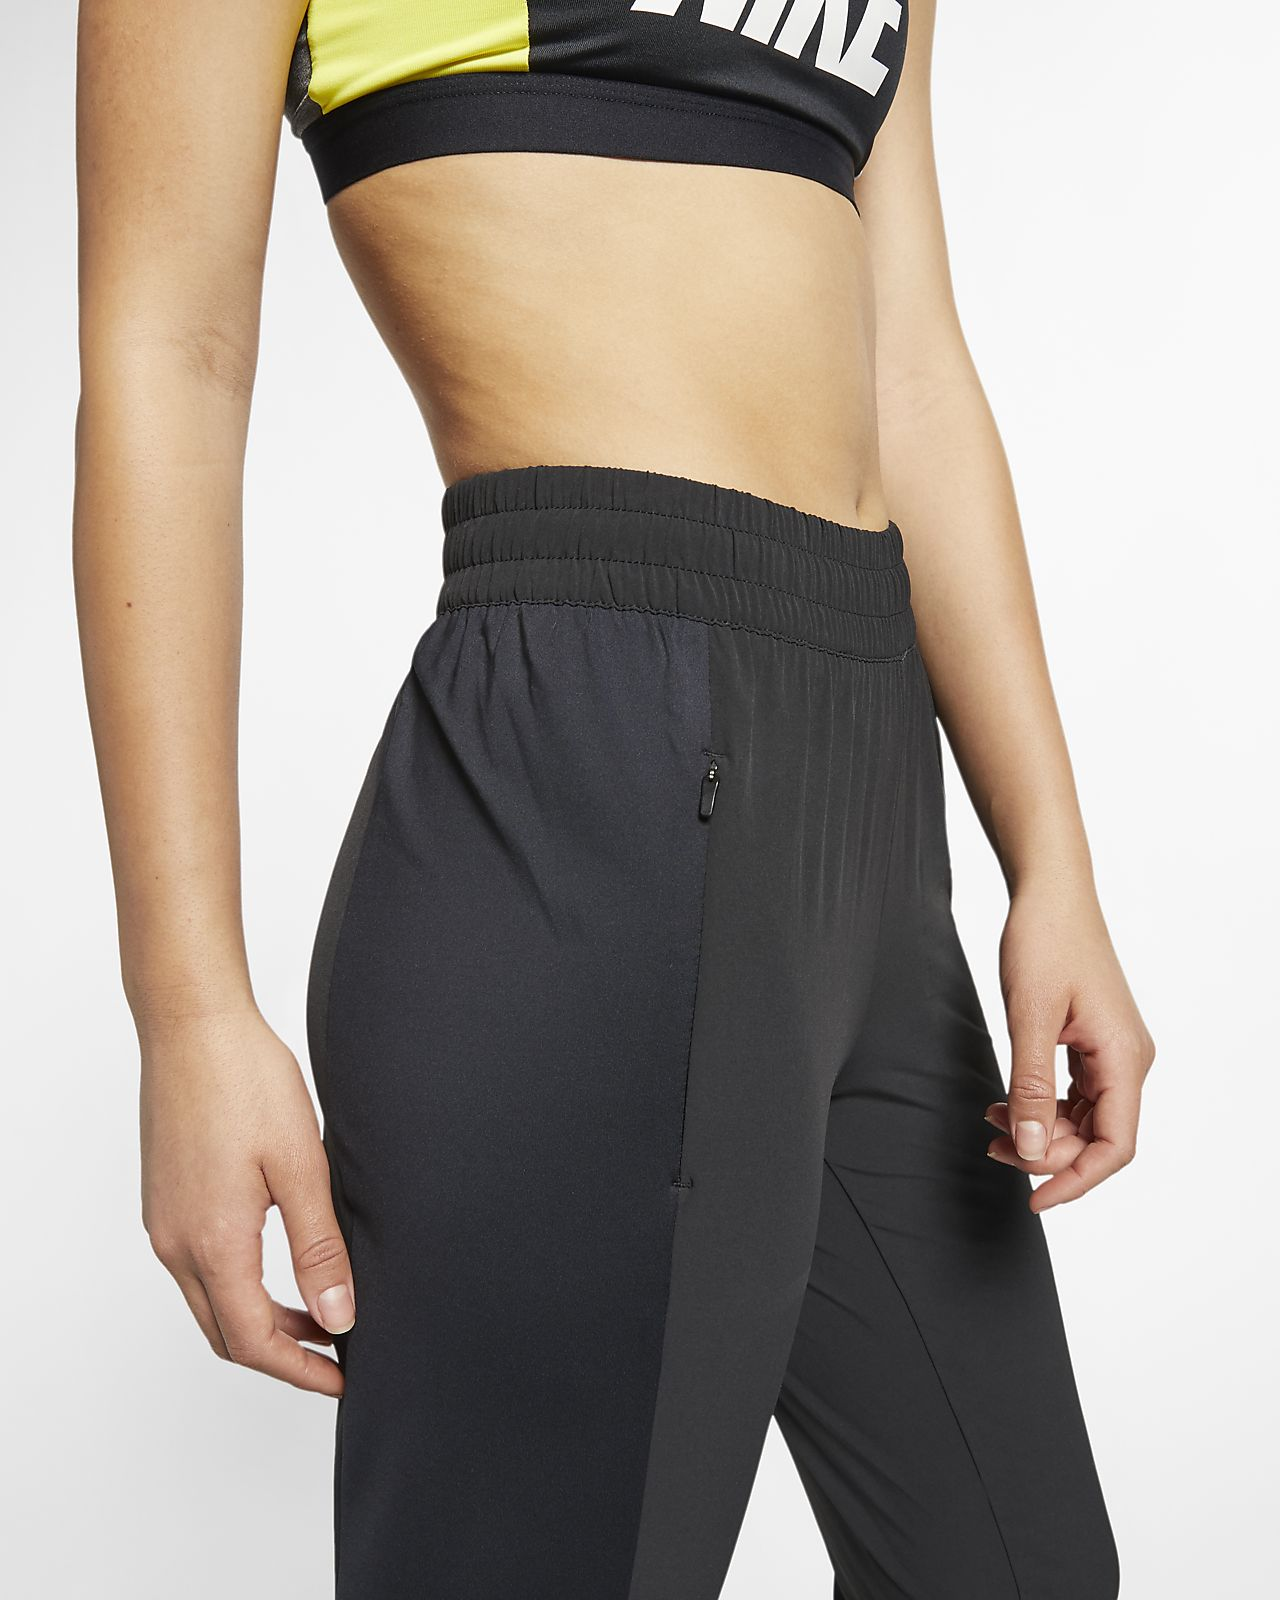 956f2ed37589 Nike Swift Women s Running Pants. Nike.com